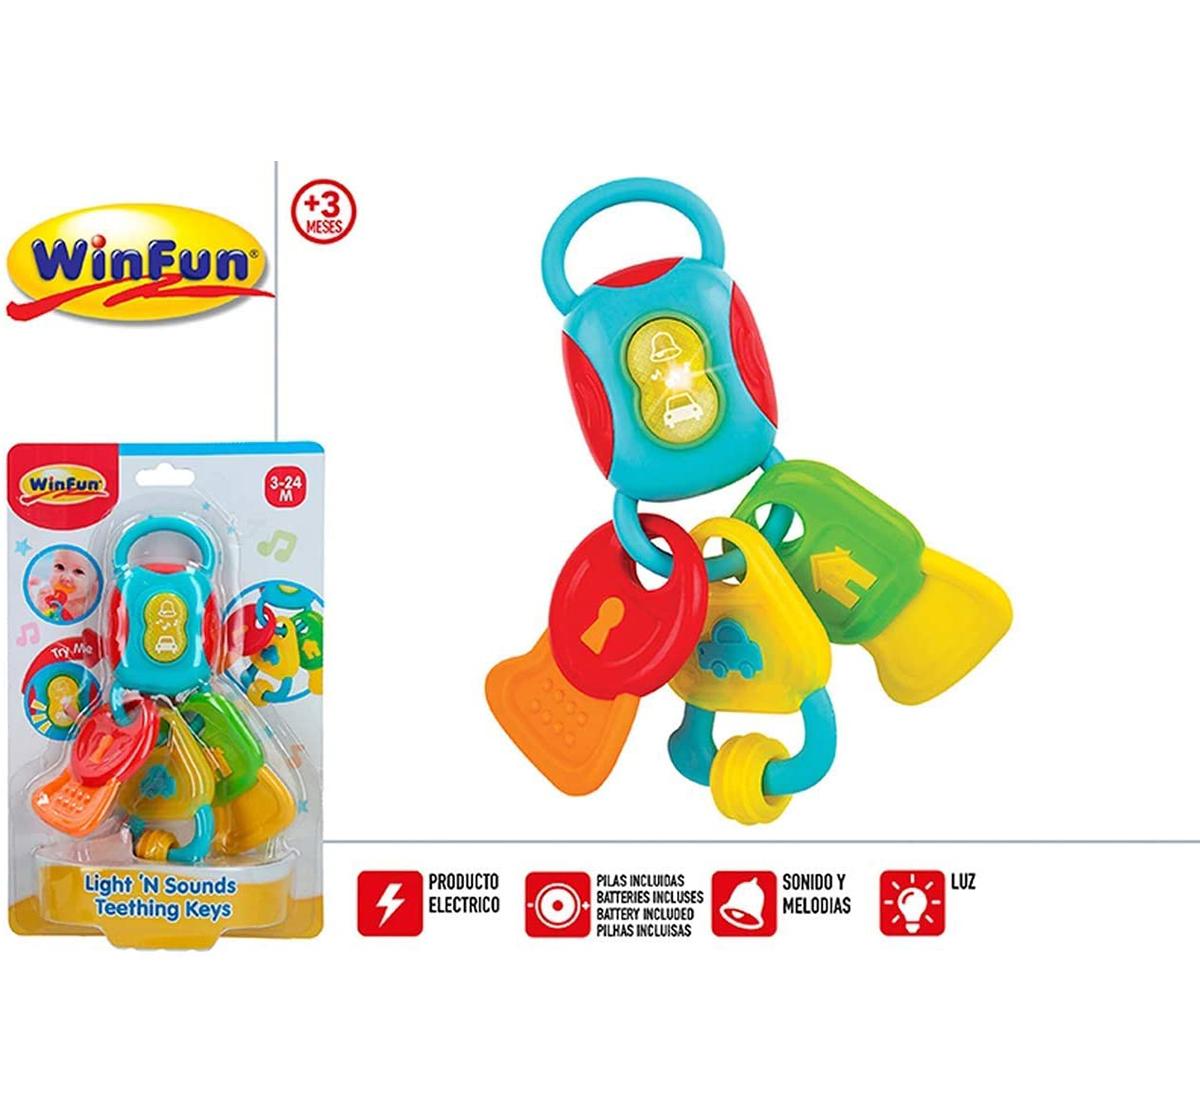 WinFun | Winfun - Light & Sounds Teething Keys New Born for Kids age 3M+